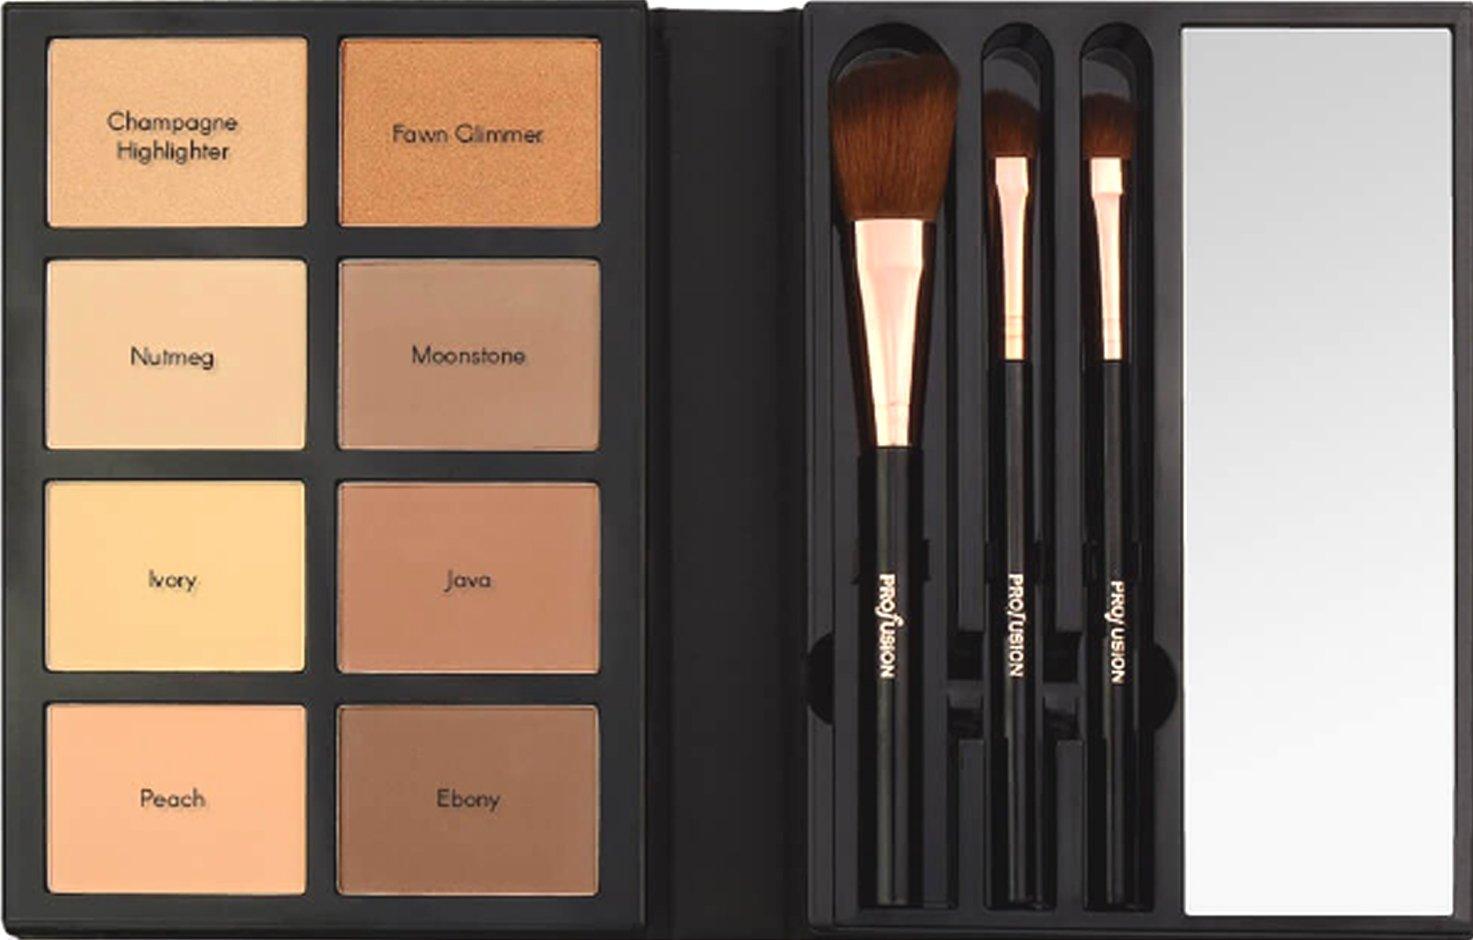 profusion face make up palette eyeshadow blush highlighter eyeliner brushes beauty. Black Bedroom Furniture Sets. Home Design Ideas